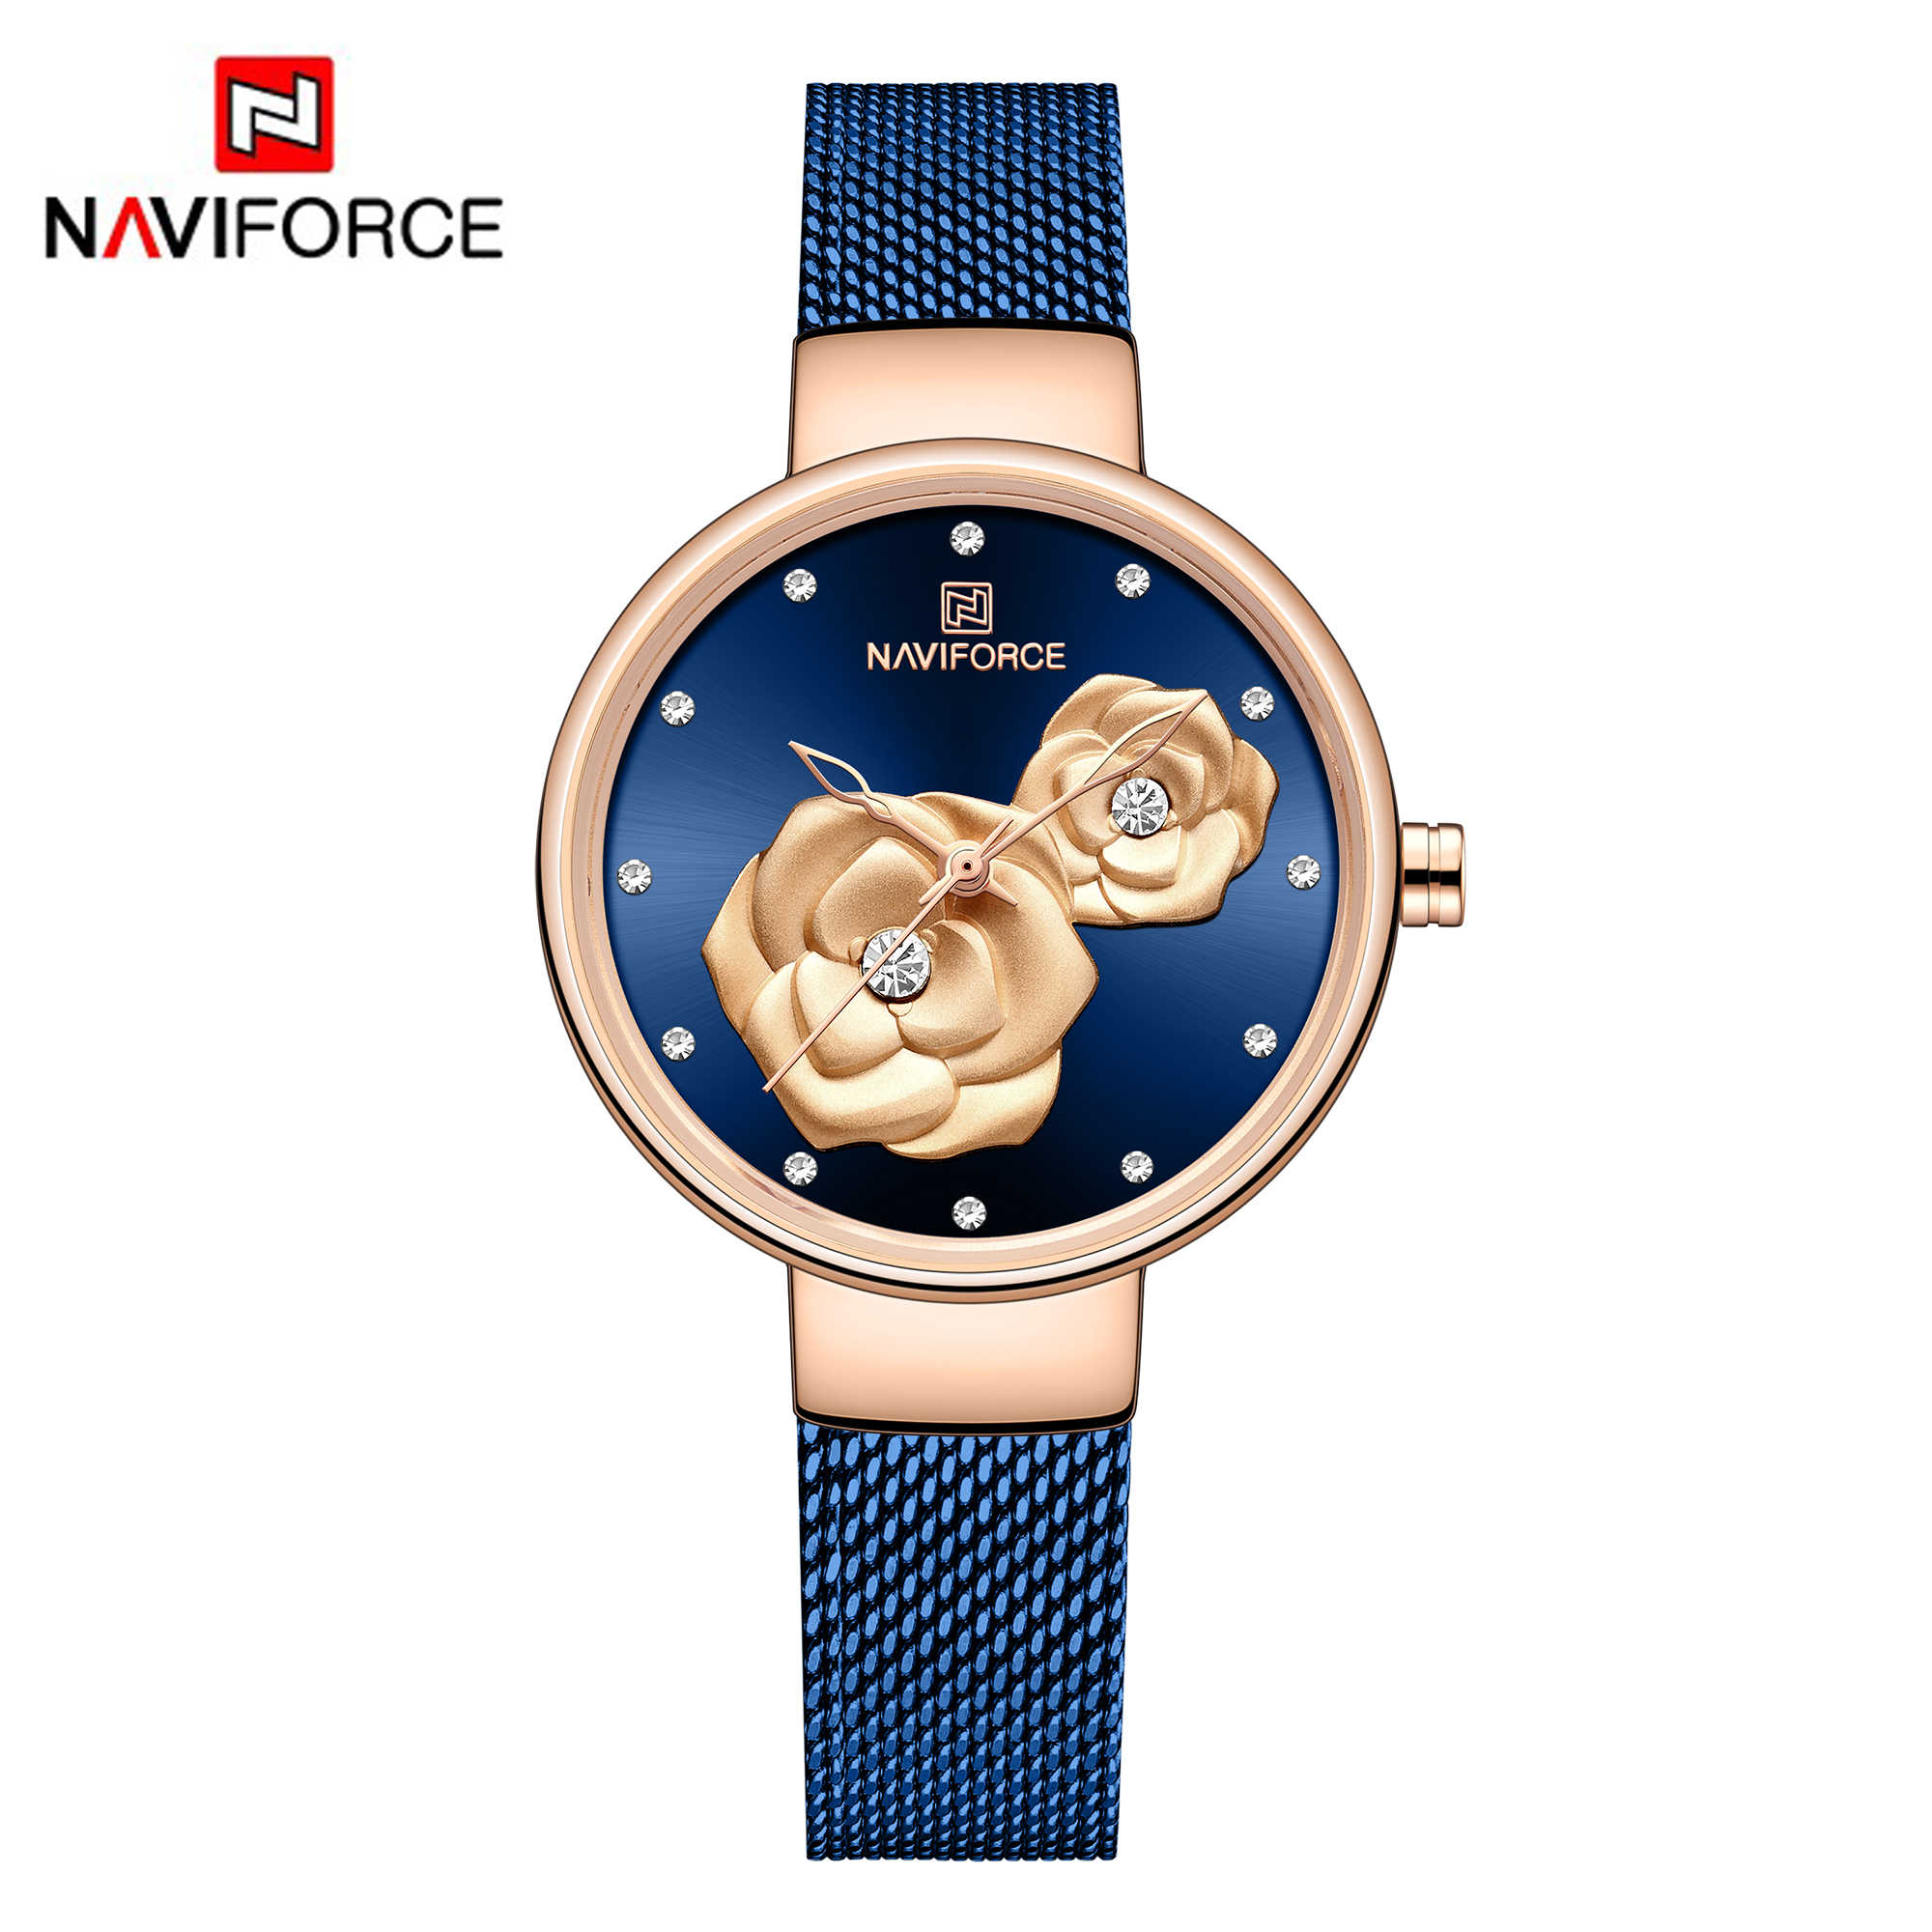 NAVIFORCE frauen Armbanduhren Luxus Kristall Stilvolle Doppel Blume Zifferblatt Damen Armband Quarzuhr Mode Armbanduhr 2019